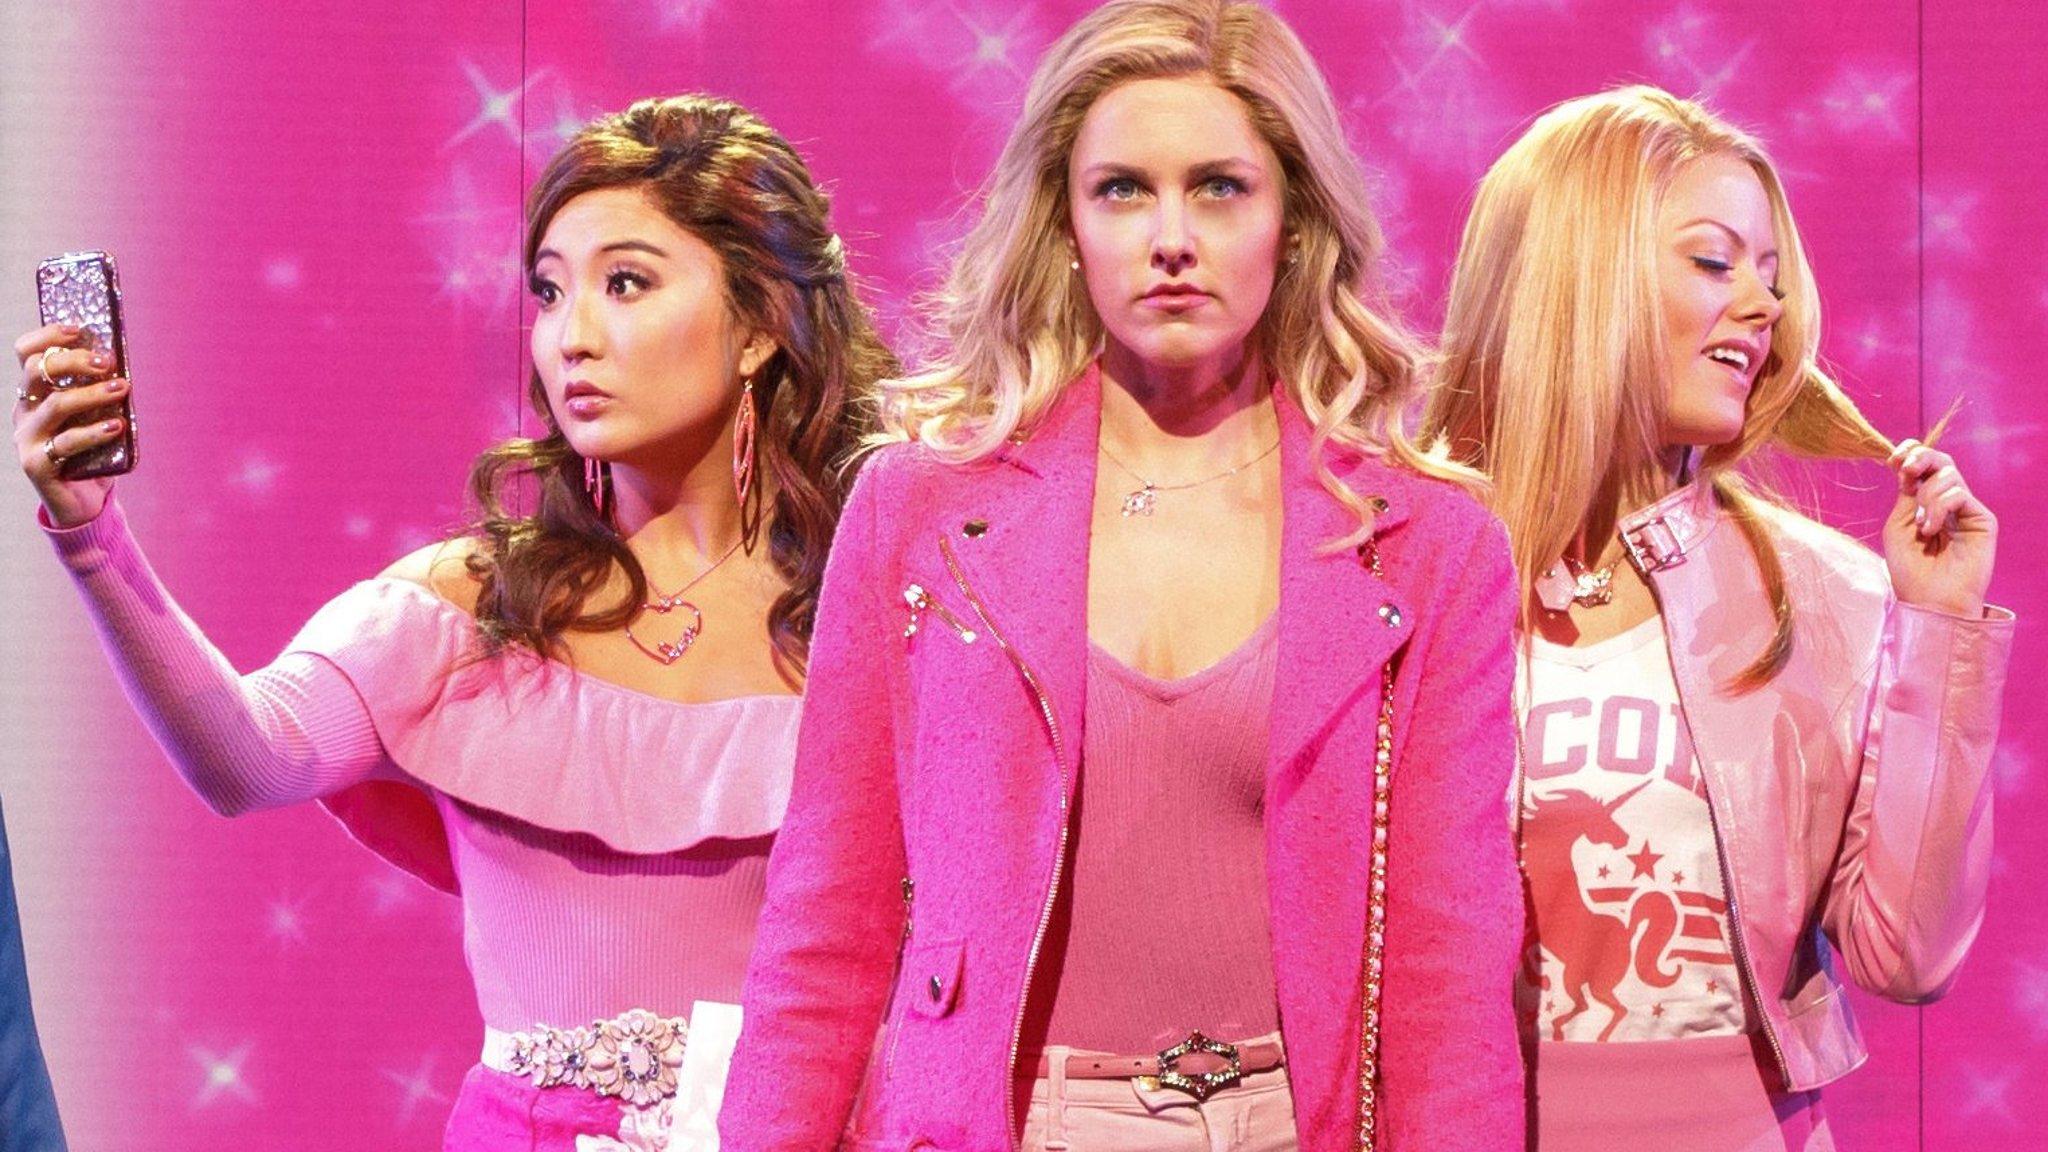 mean girls, august wilson theatre, new york — a deficit of nastiness